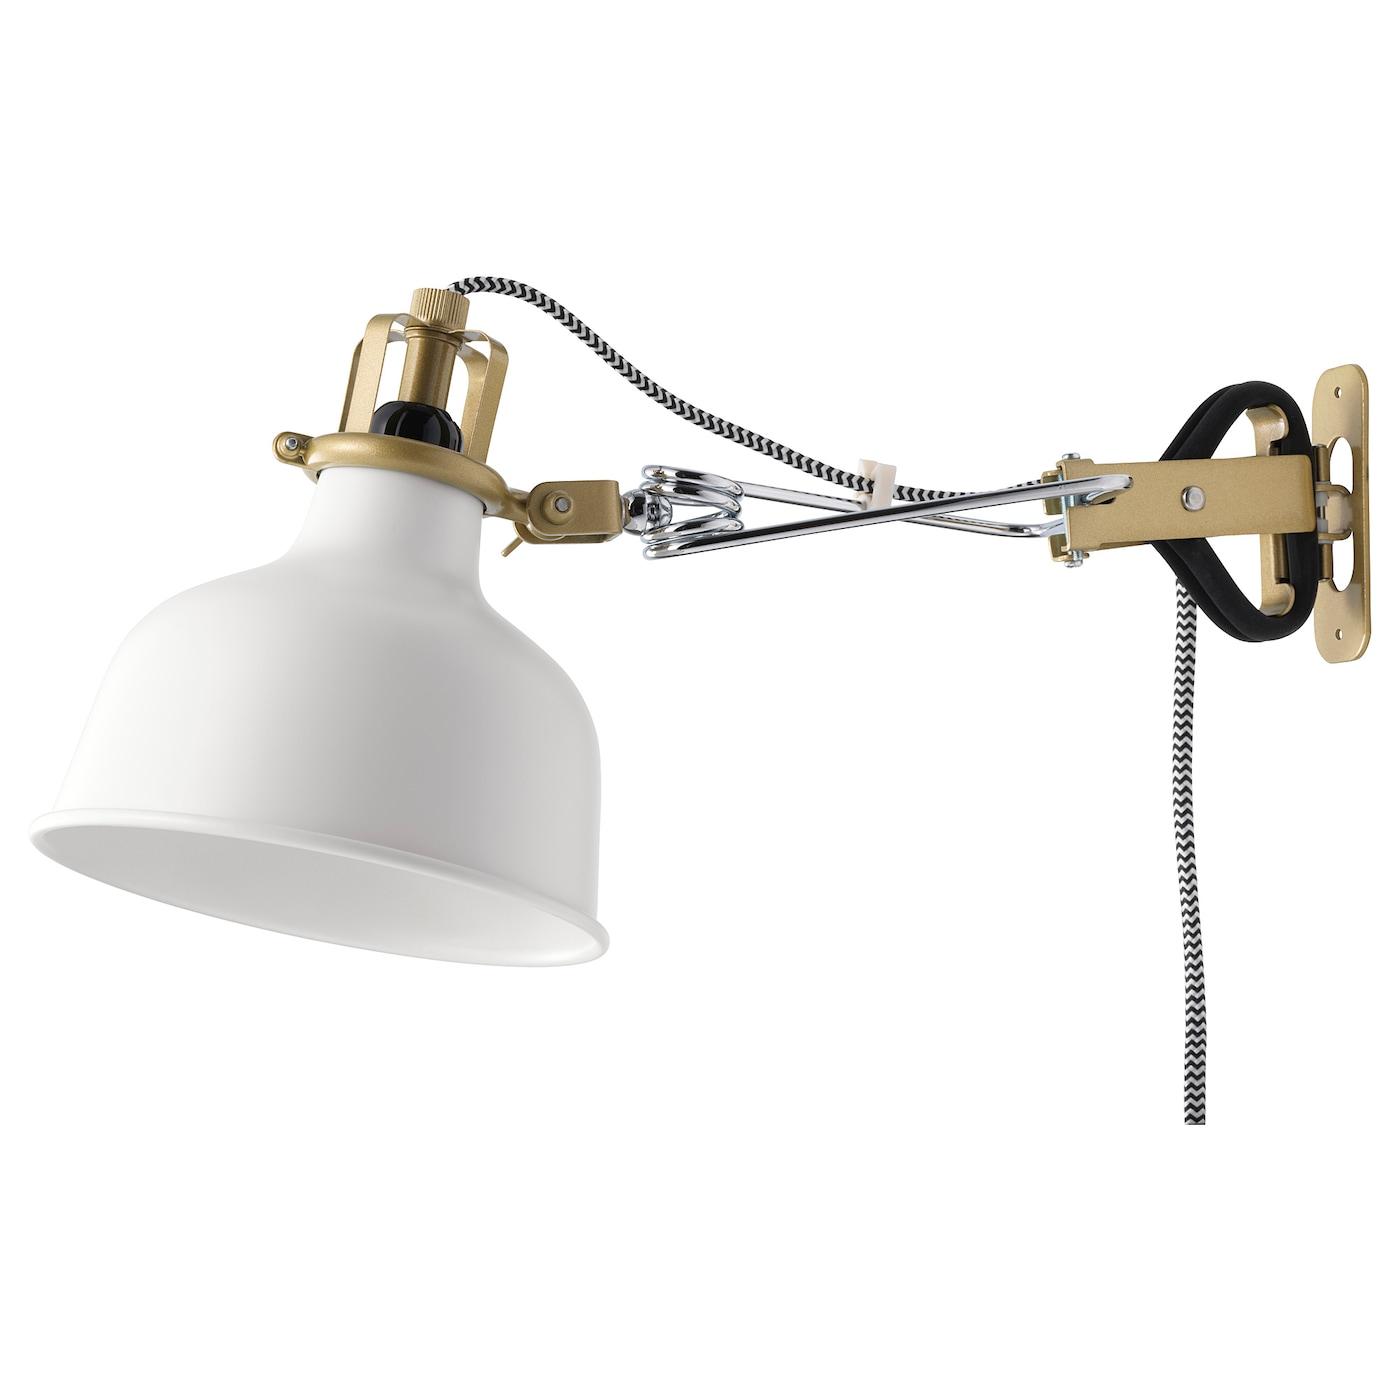 RANARP Wall/clamp spotlight - off-white